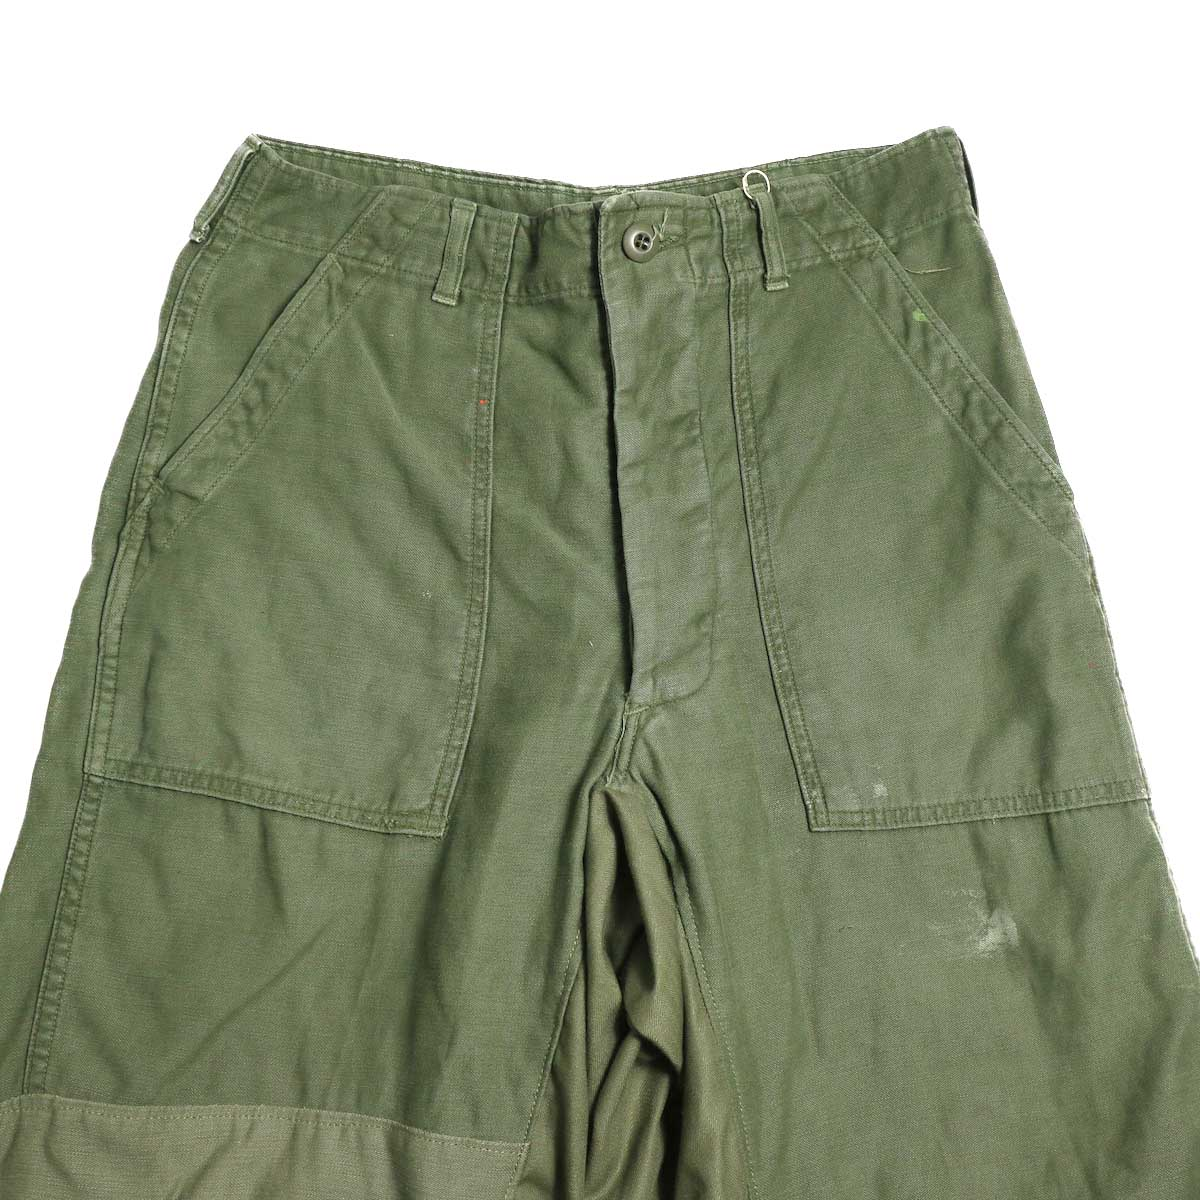 BONUM / Military FAT Pants (A) 股上